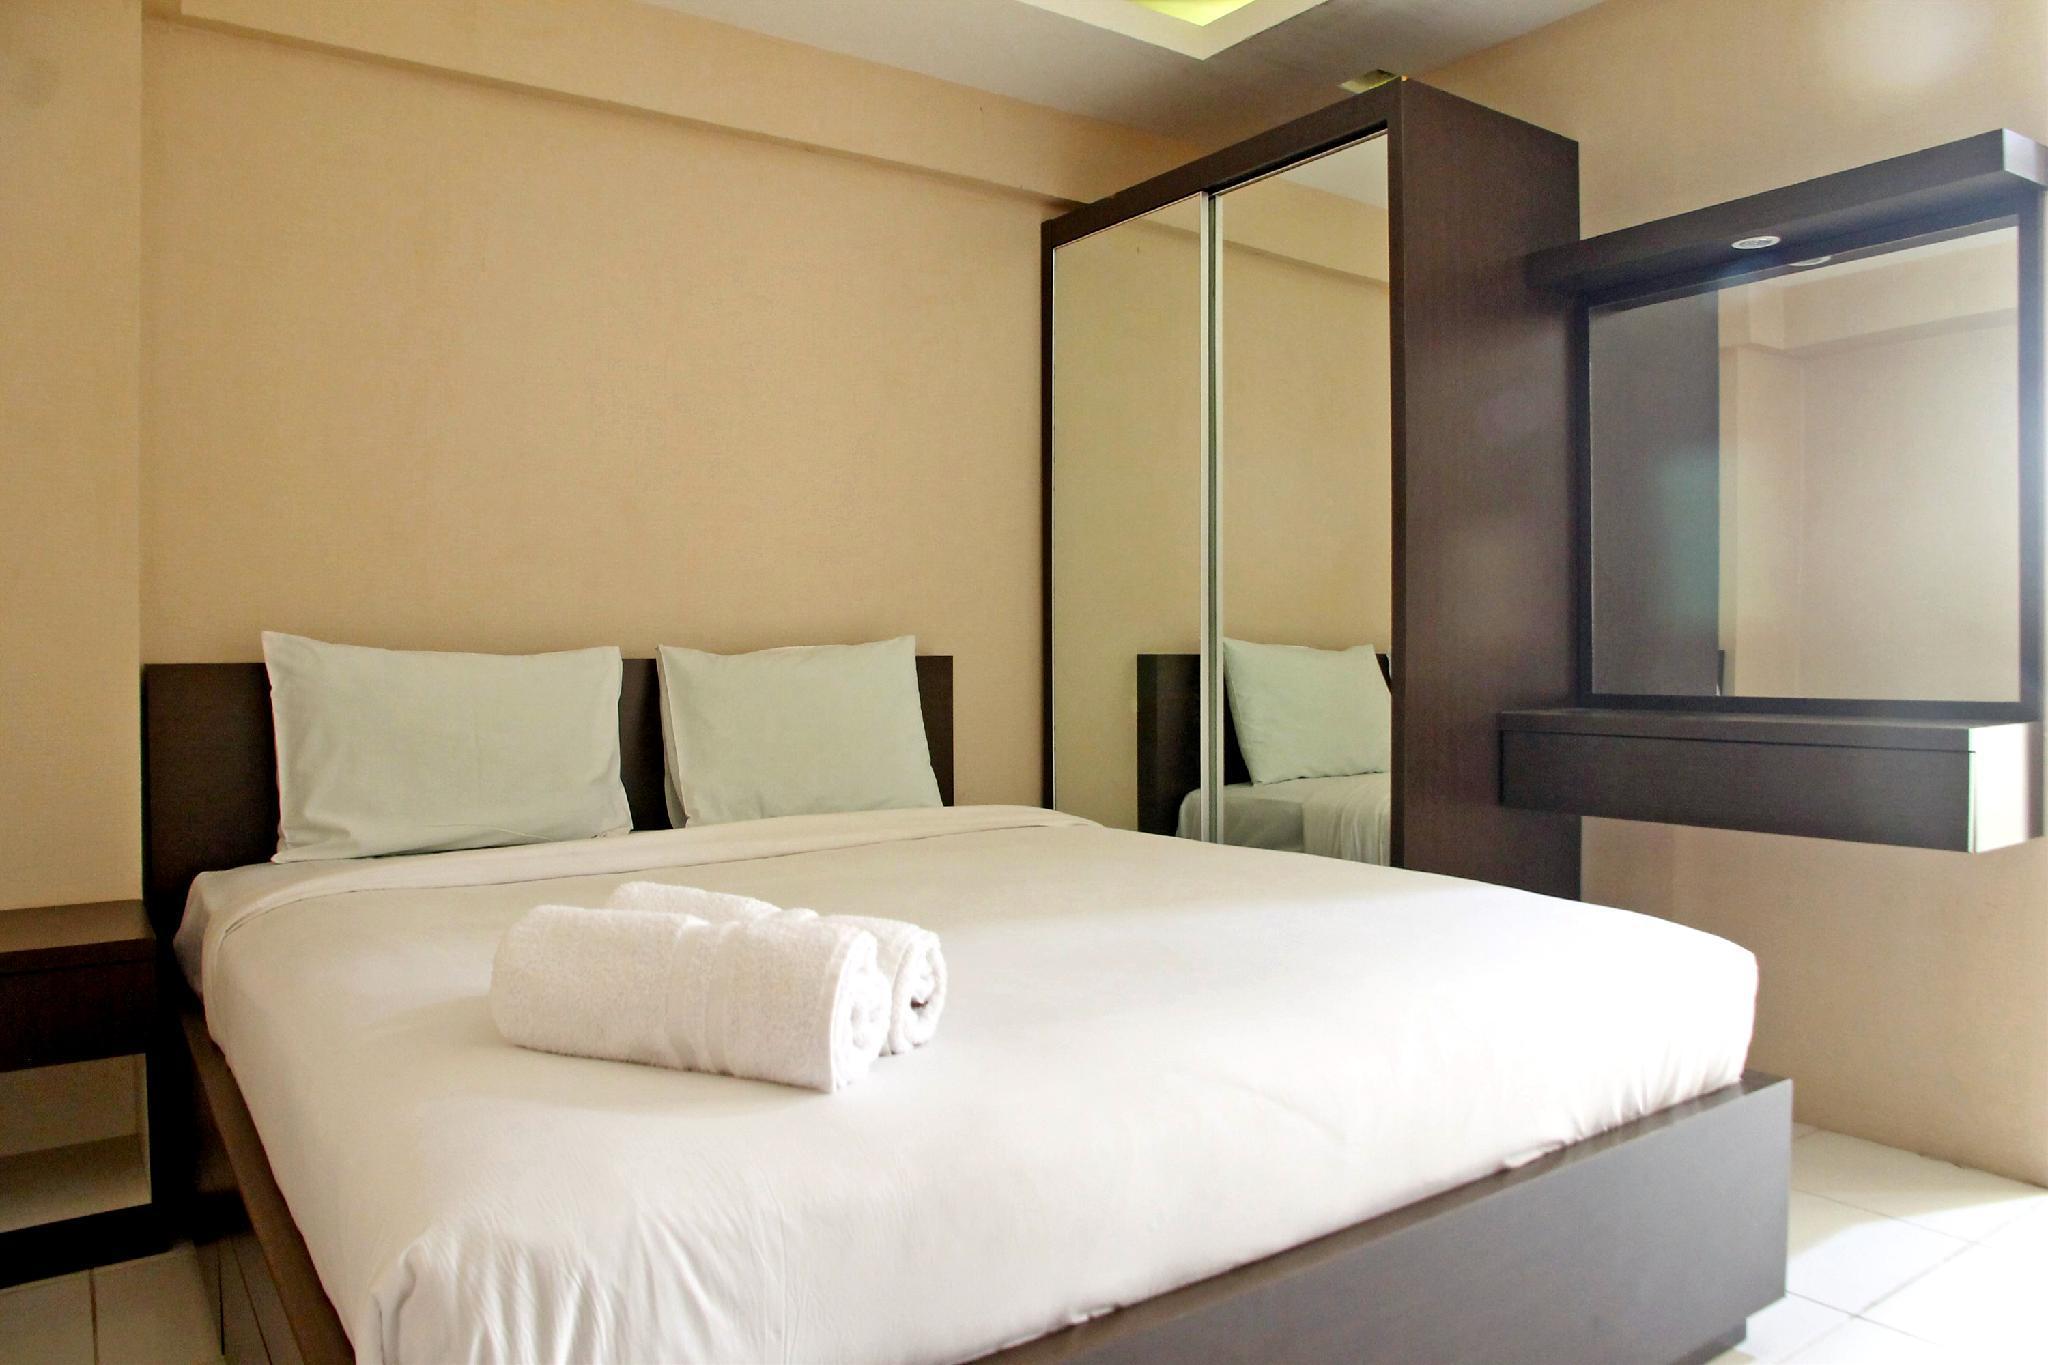 Best Deal Studio At Kebagusan City Apartment By Travelio